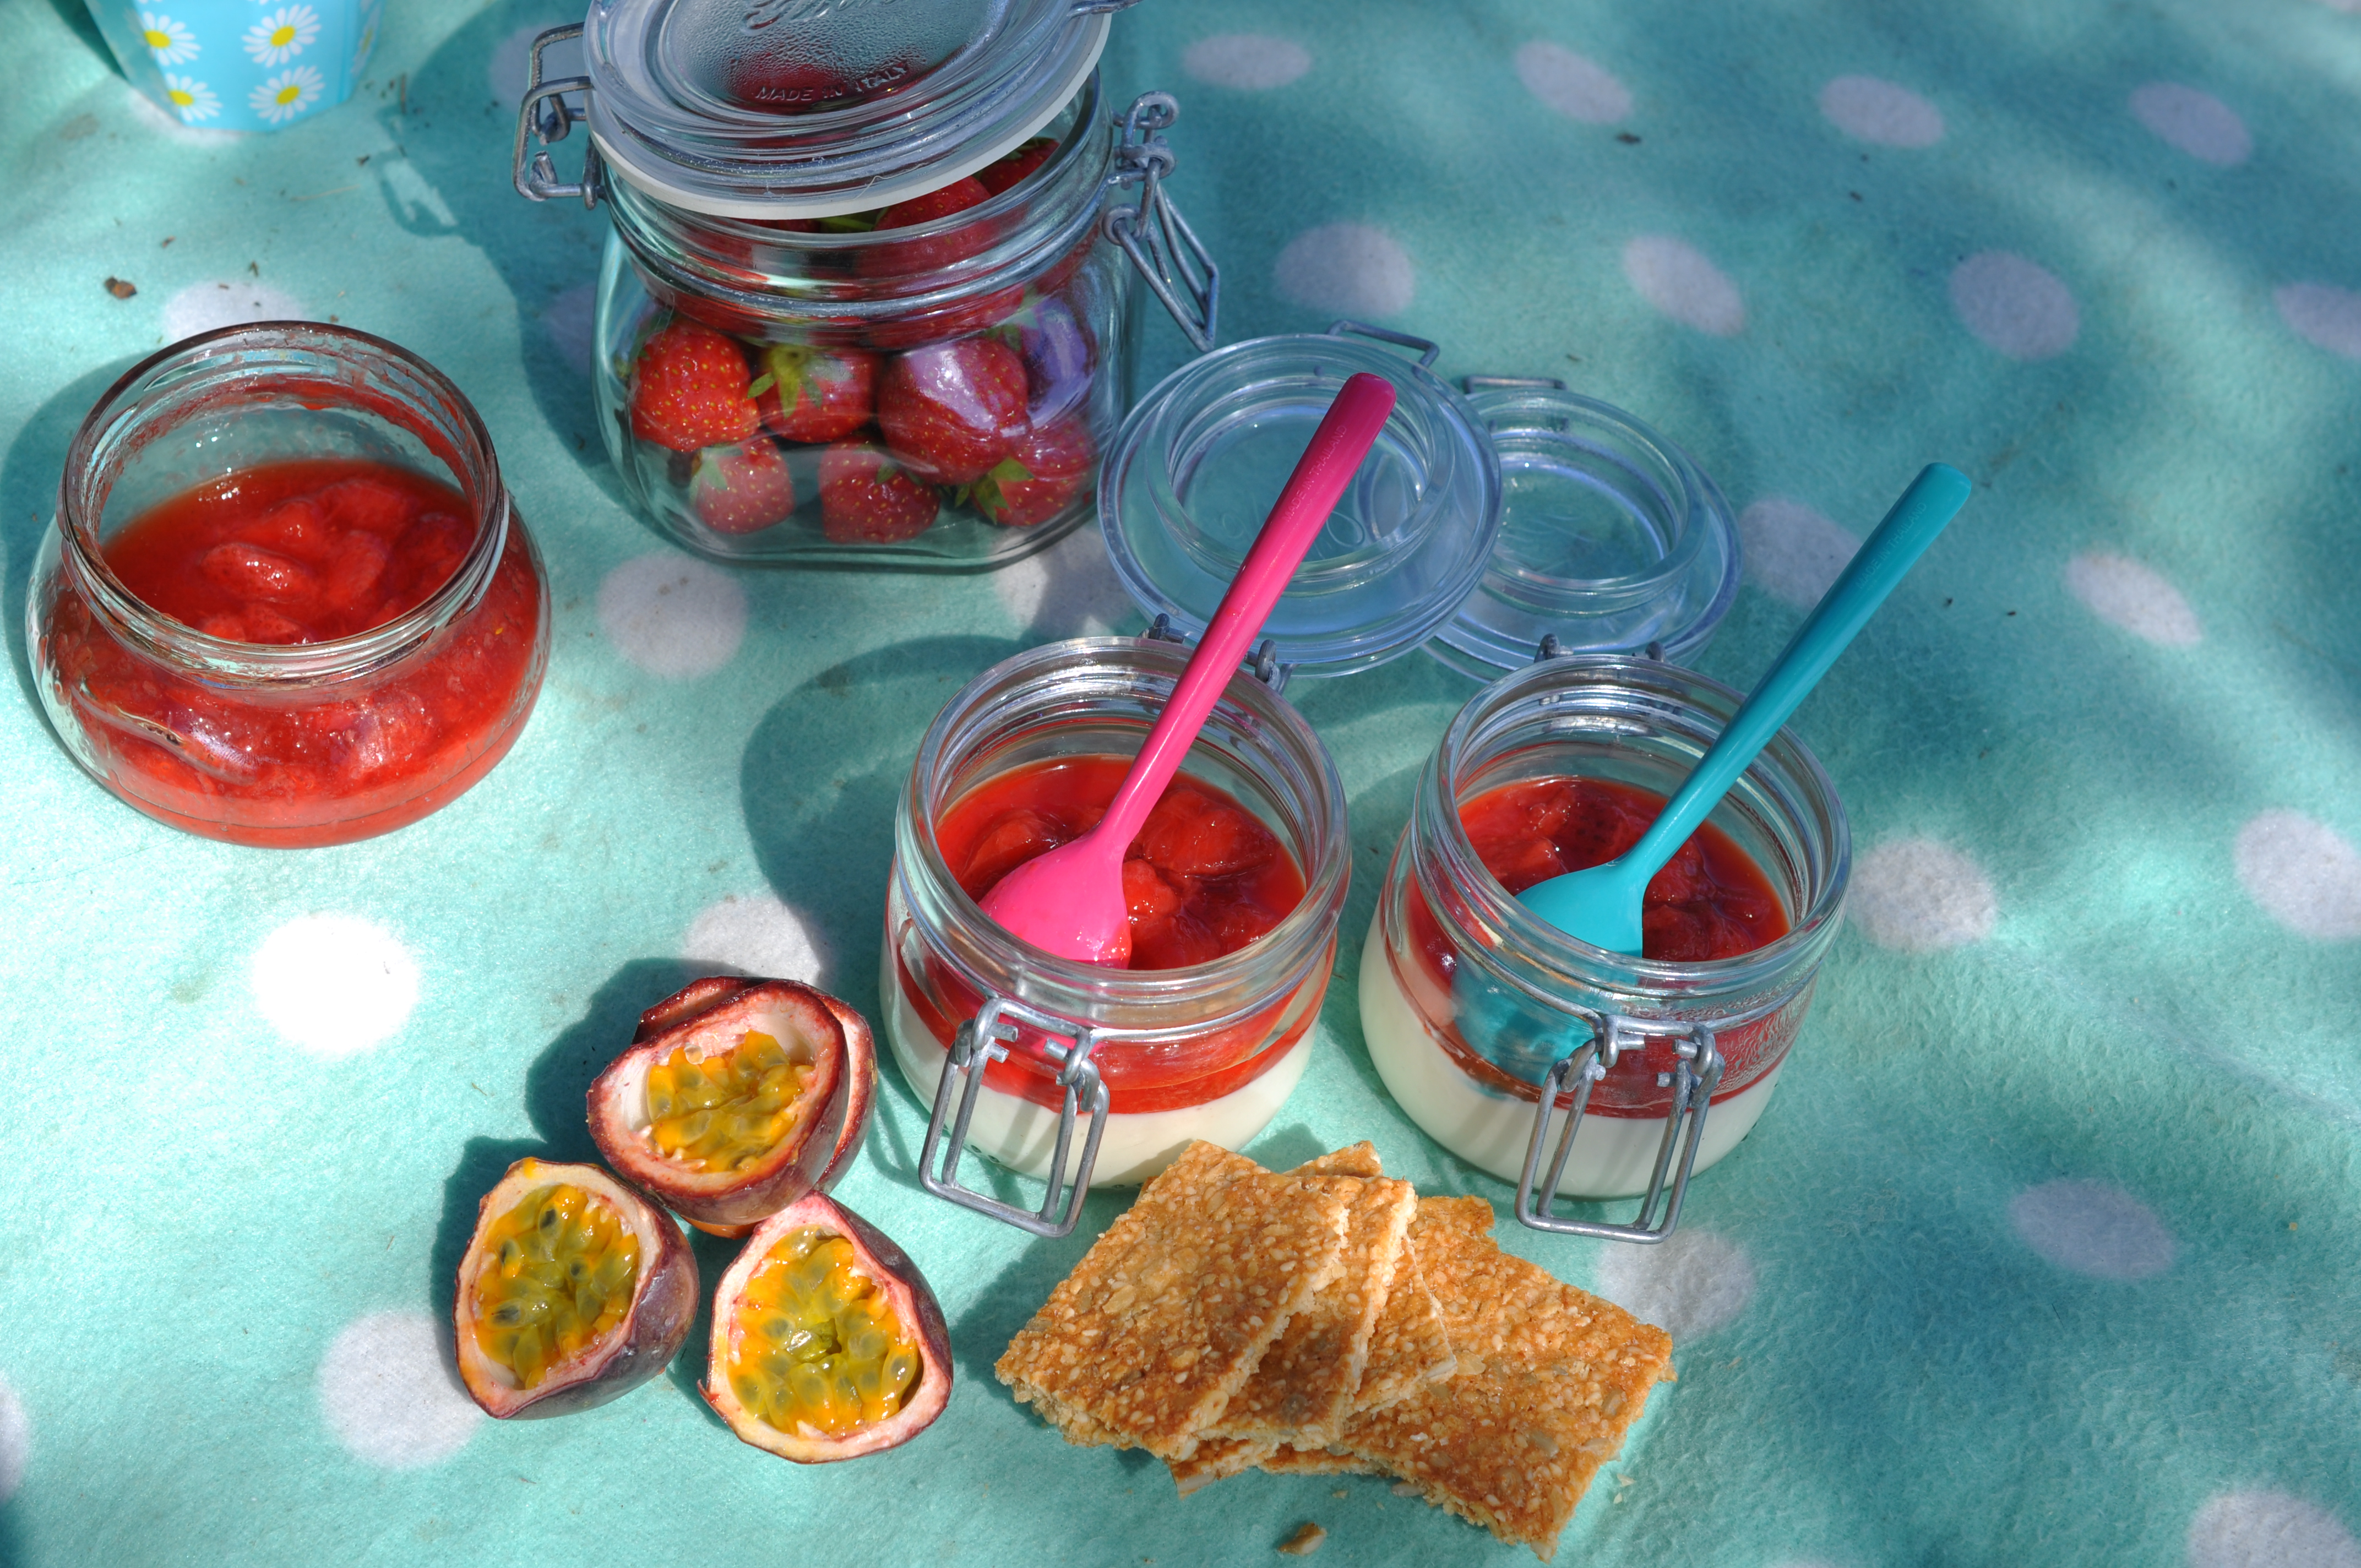 pannacotta med jordgubbssalsa